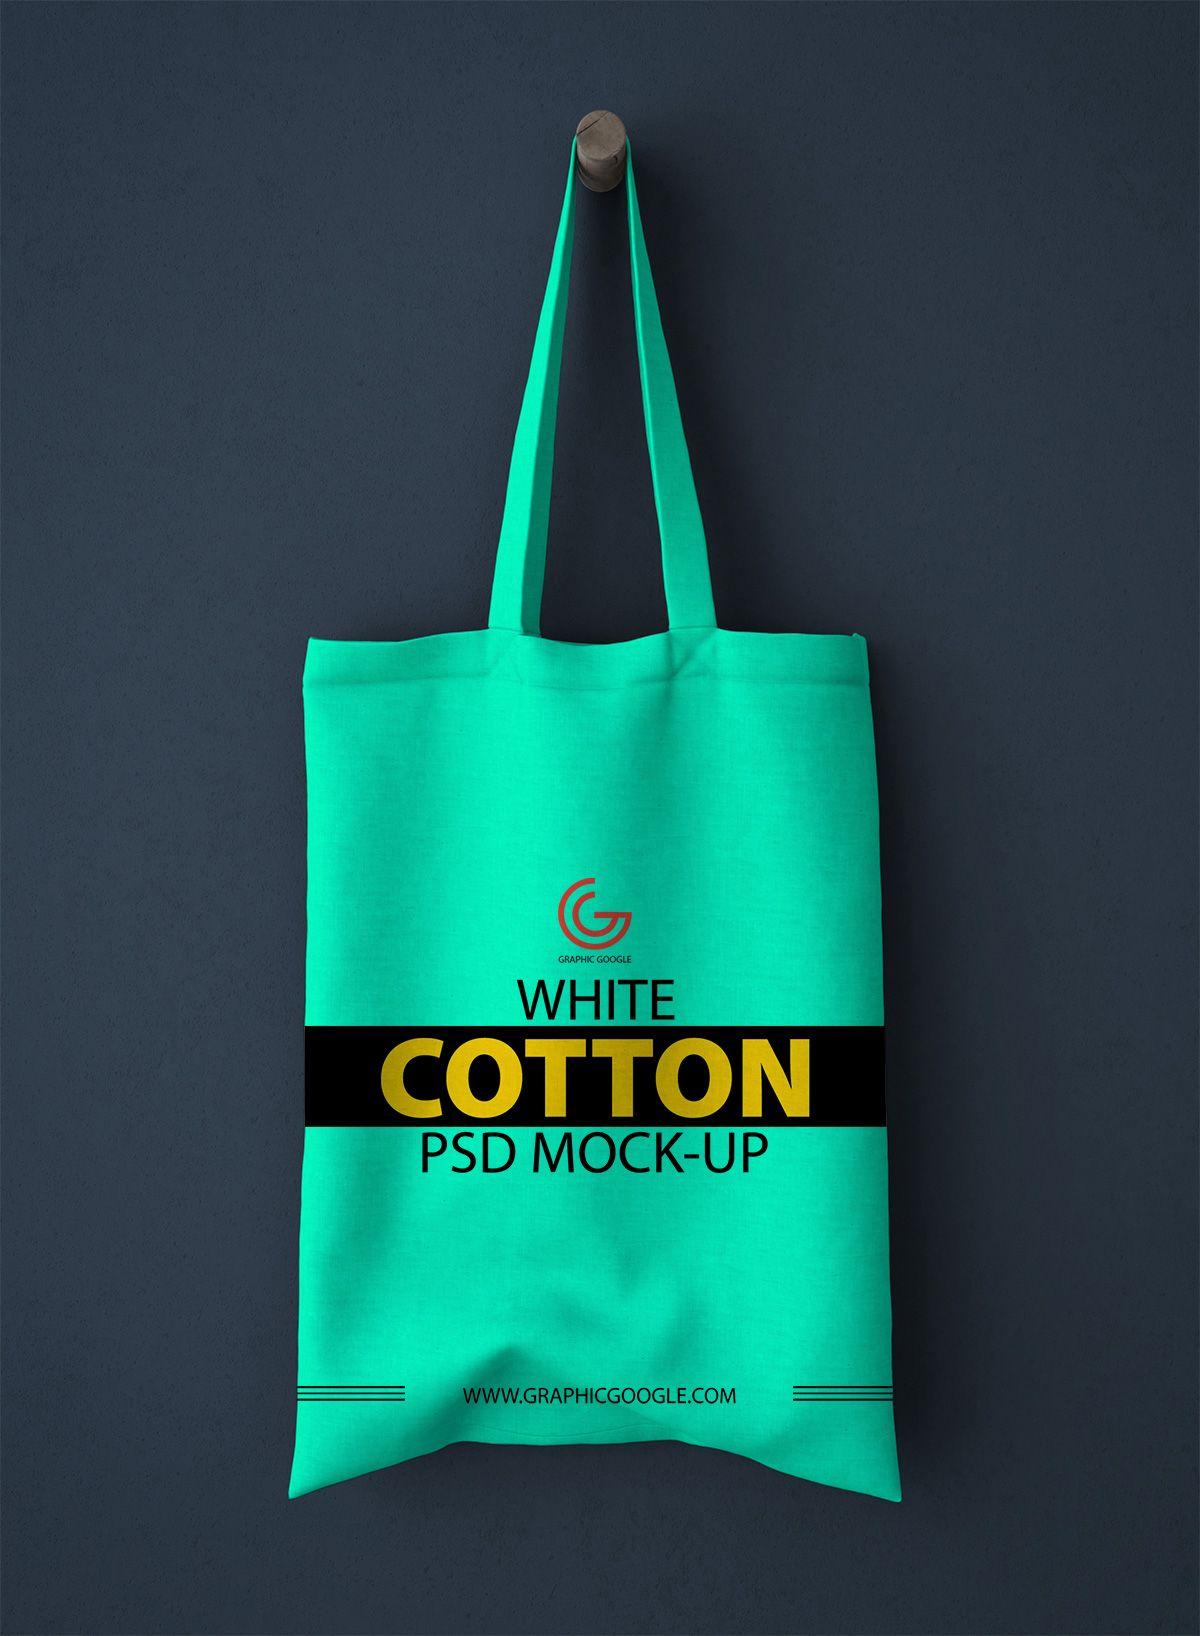 Download Cotton Bag Psd Mockup For Eco Friendly Packaging Option Cotton Bag Psd Mockup Ecofriendly Packaging Cotton Bag Bags Mockup Psd